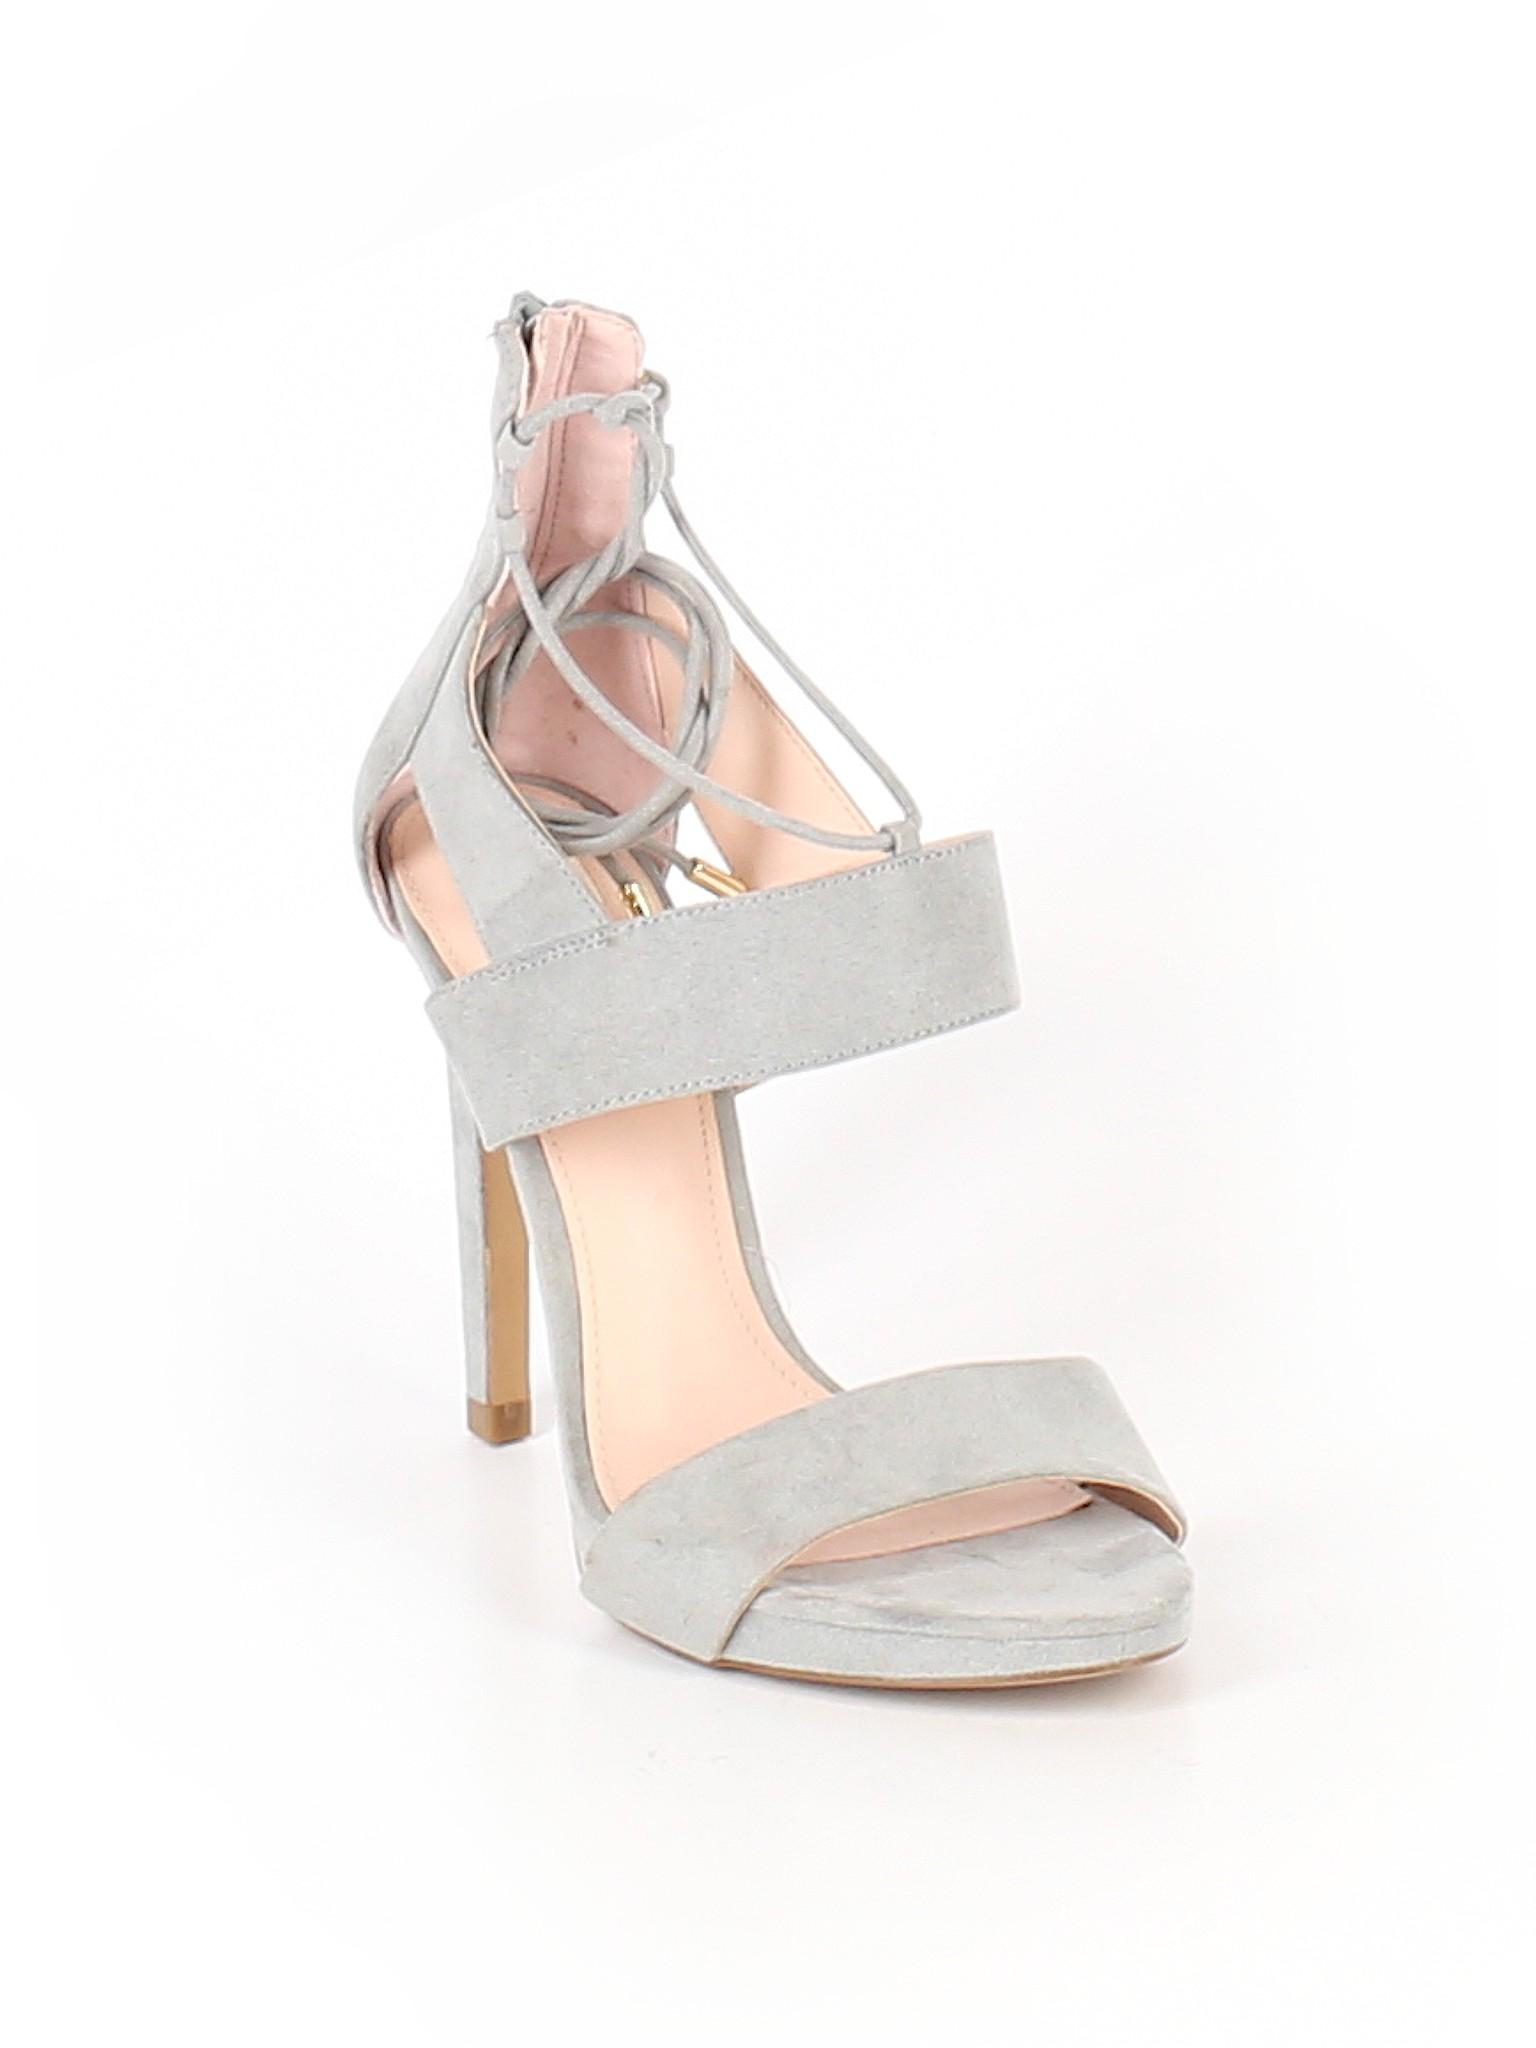 promotion Zara by Trafaluc Boutique Heels UxqPwxcvAf